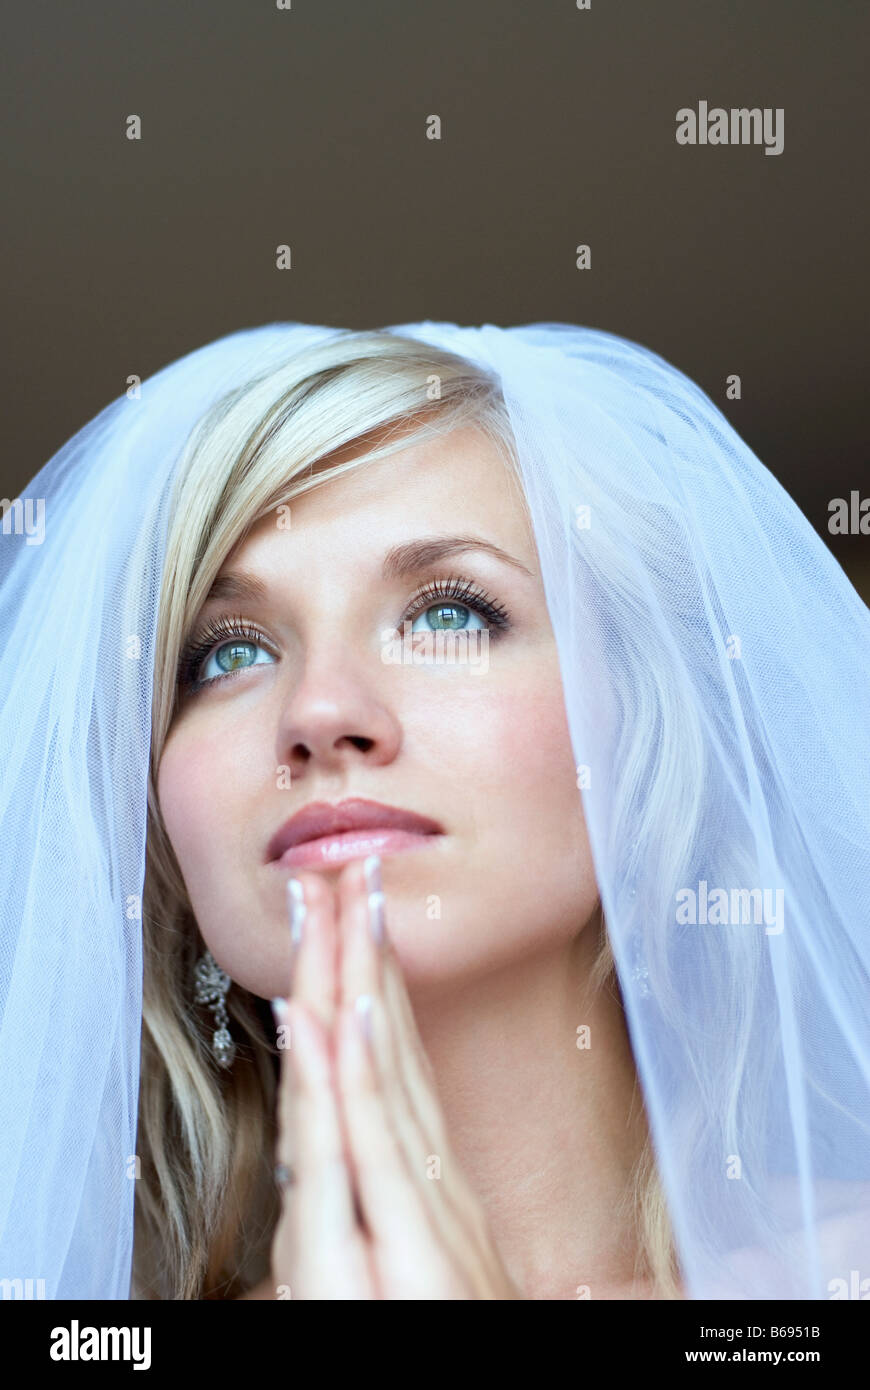 Braut beten unter Schleier, Nahaufnahme Stockfoto